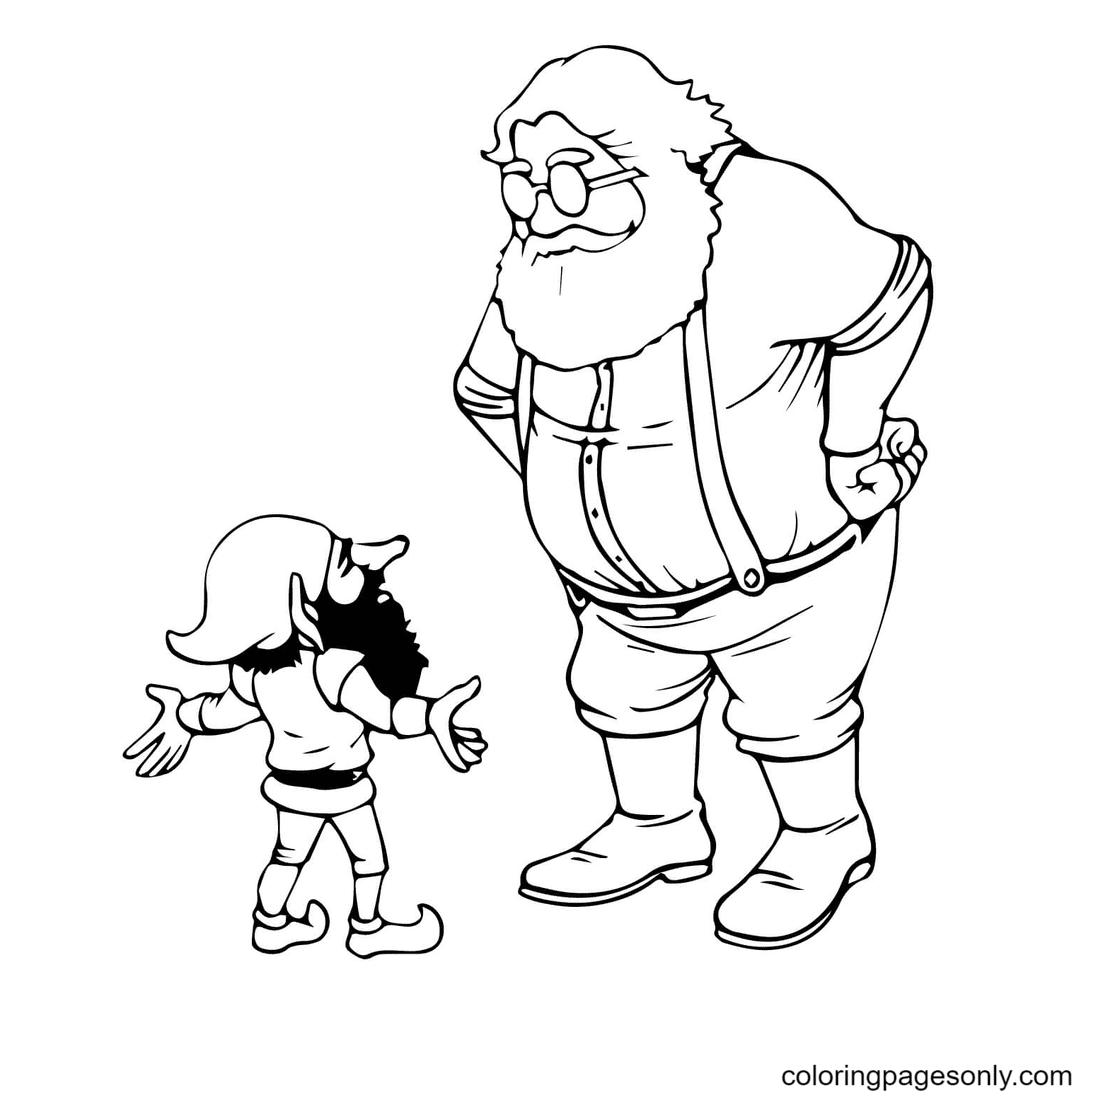 Santa and Christmas Elf Coloring Page